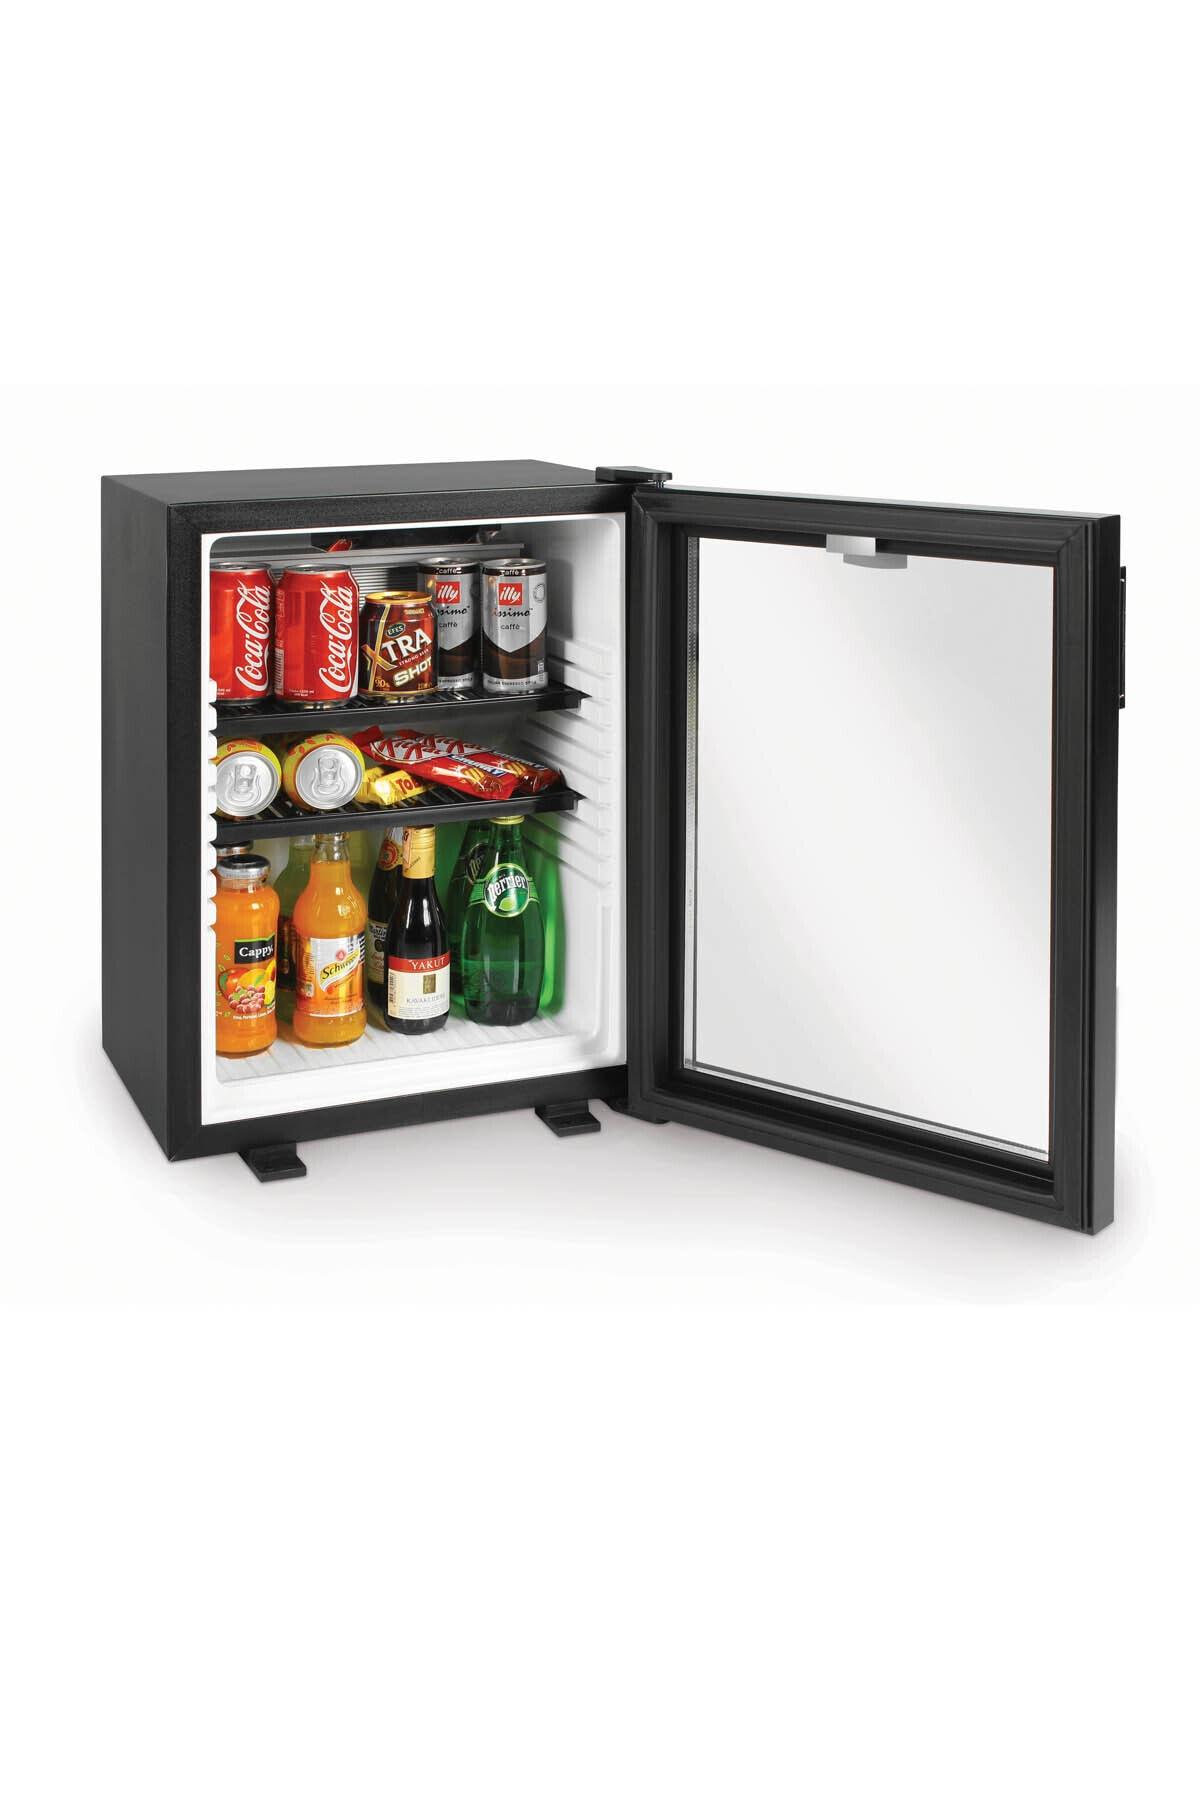 Elektromarla Siyah Cam Kapılı Minibar - Drc 35 lt 2